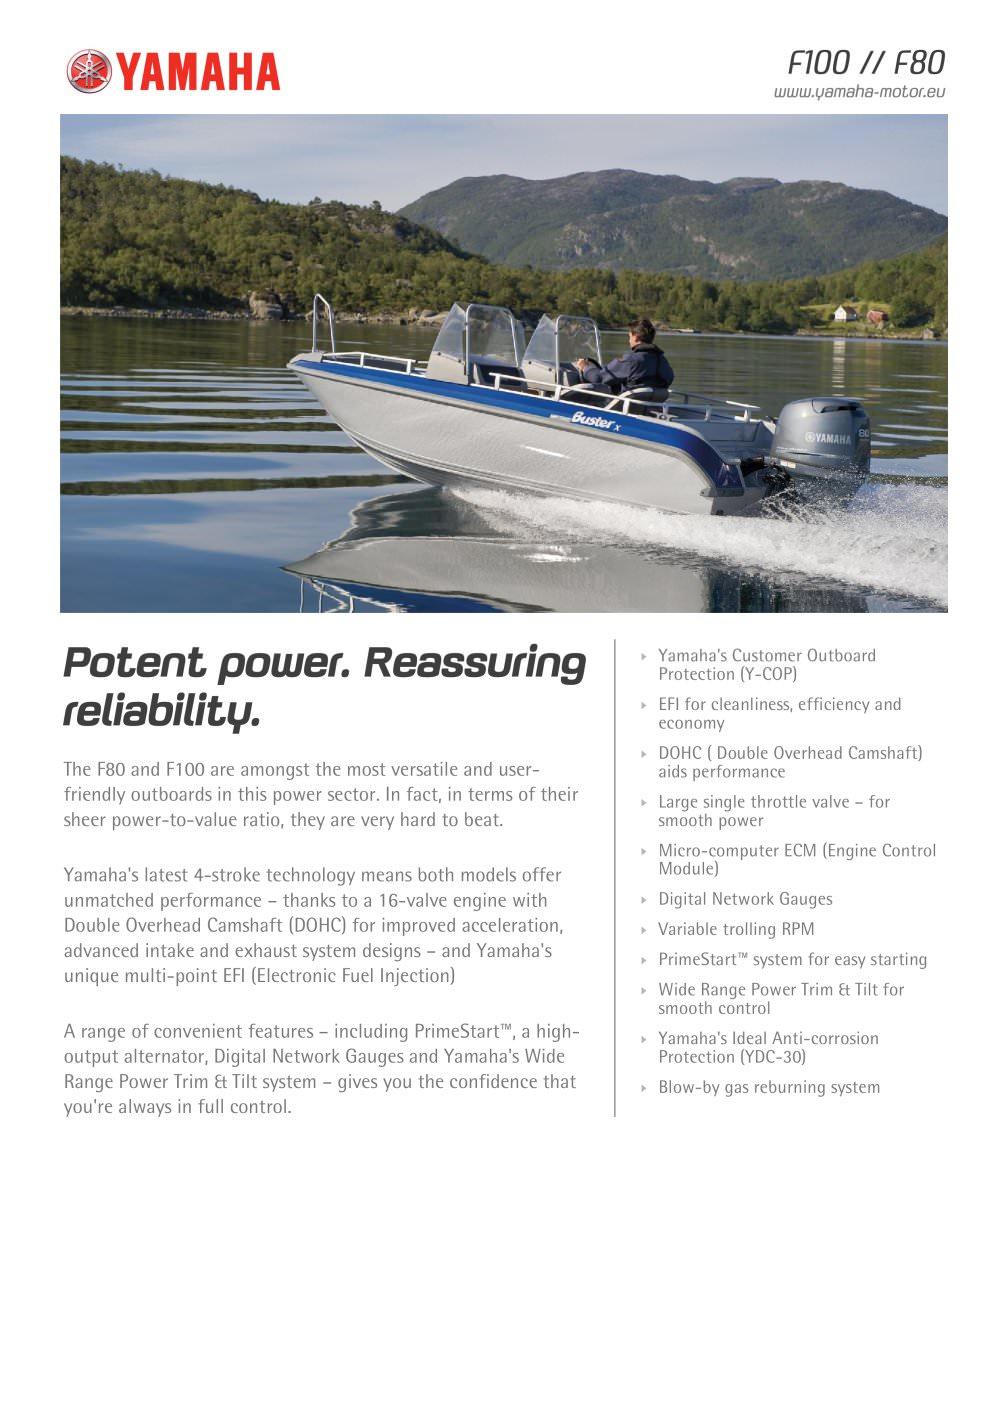 Yamaha-2012-F100--F80 - 1 / 5 Pages